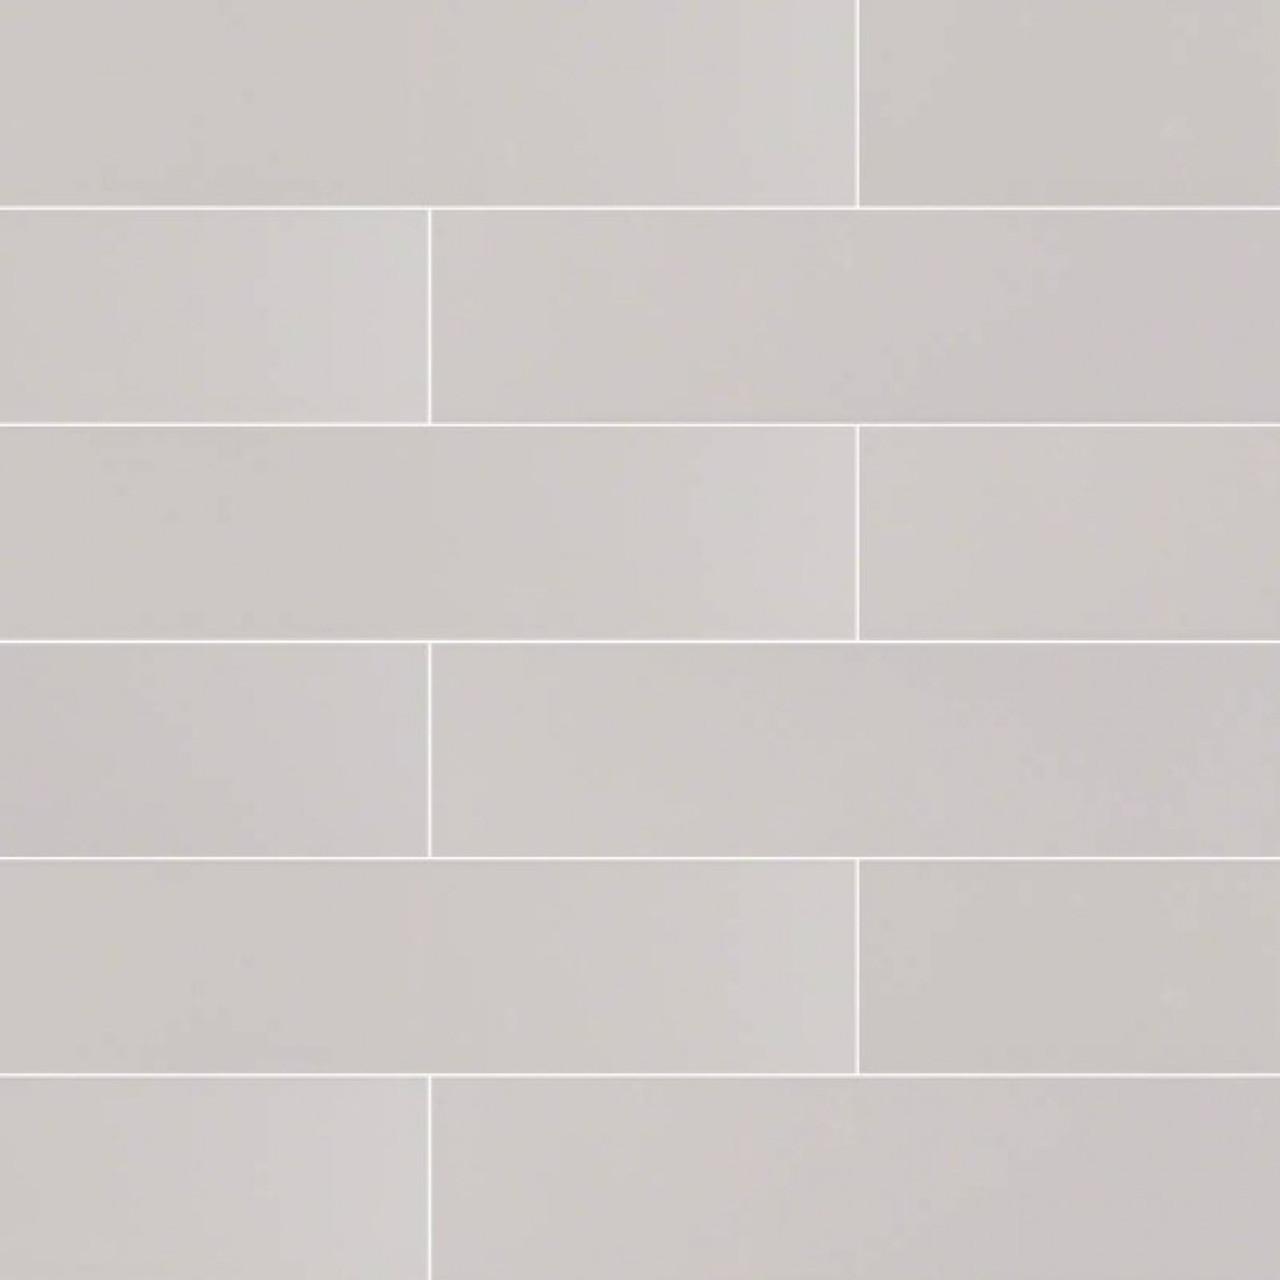 ms international backsplash series domino gray glossy 4x16 subway tile ngraglo4x16